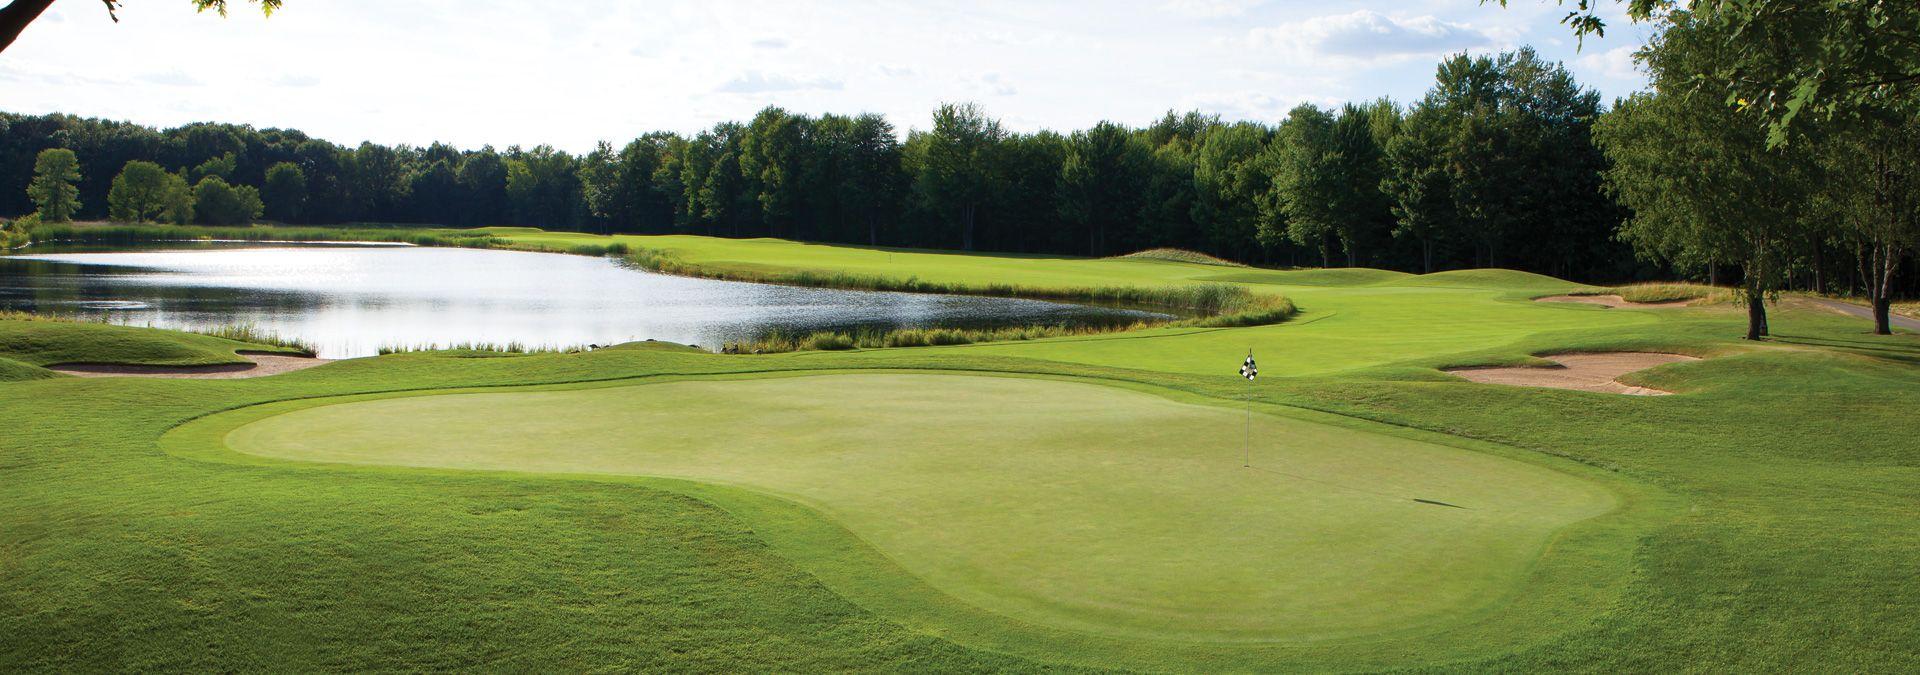 35+ Bucks run golf course in mount pleasant michigan info